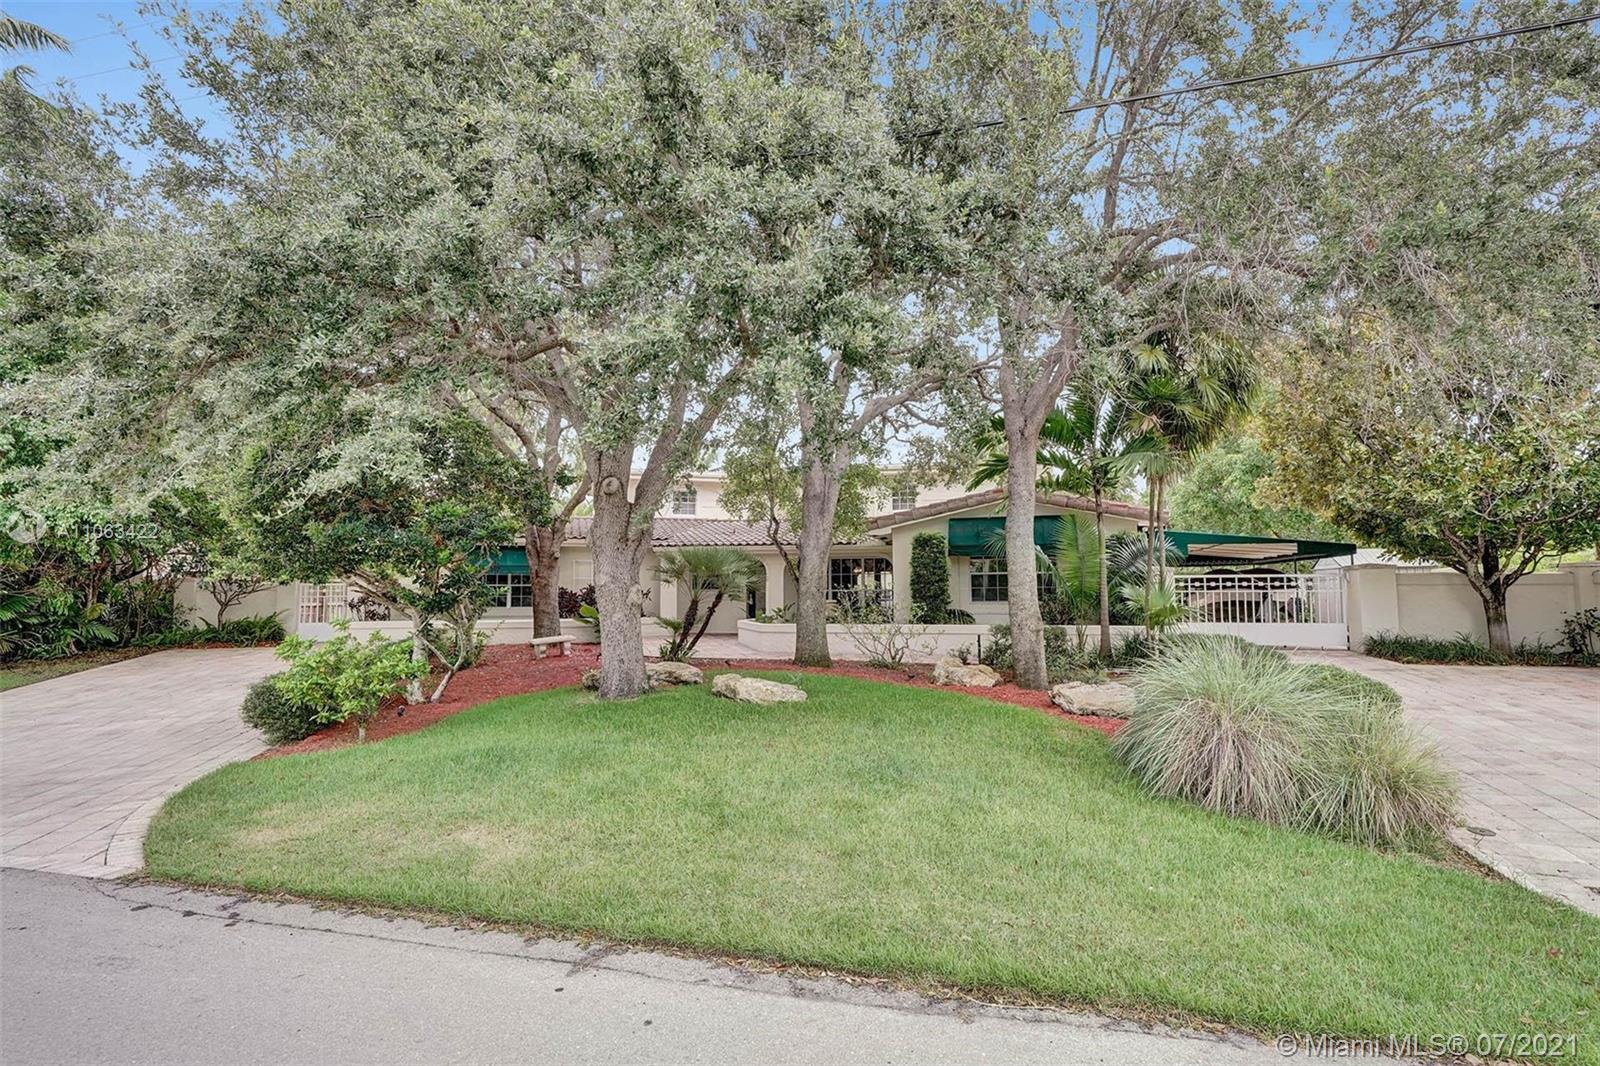 1809 Coral Gardens Dr, Wilton Manors, Florida 33306